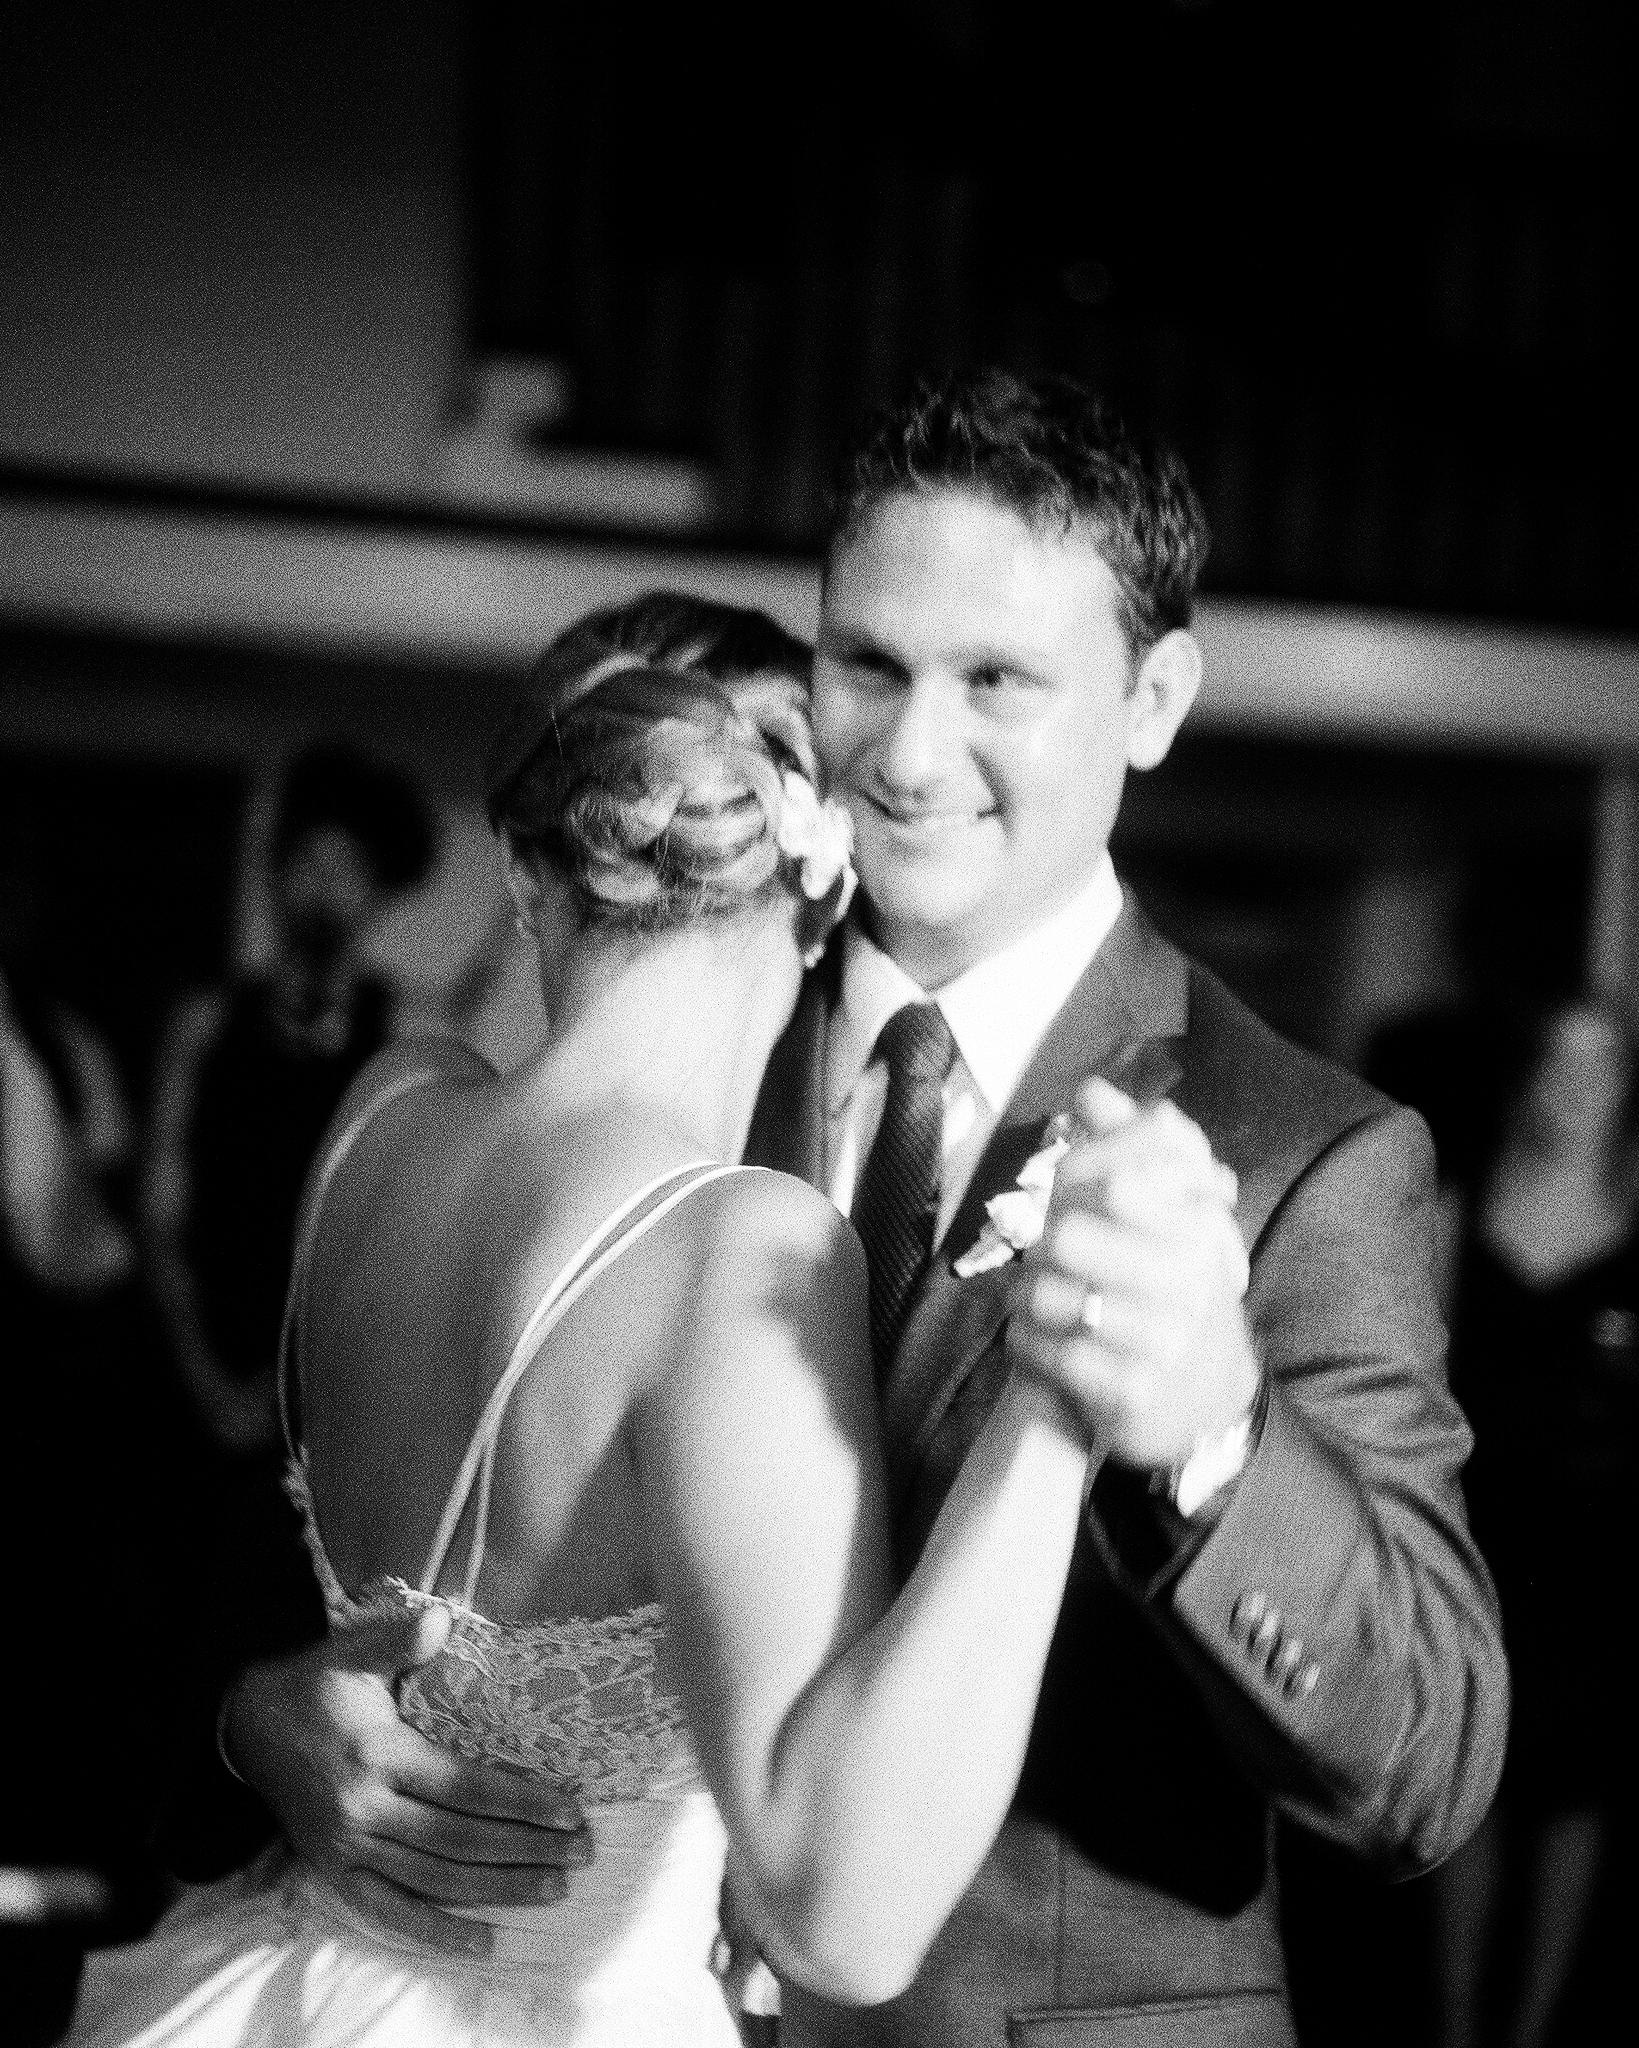 beth-scott-wedding-dance-0812-s112077-0715.jpg